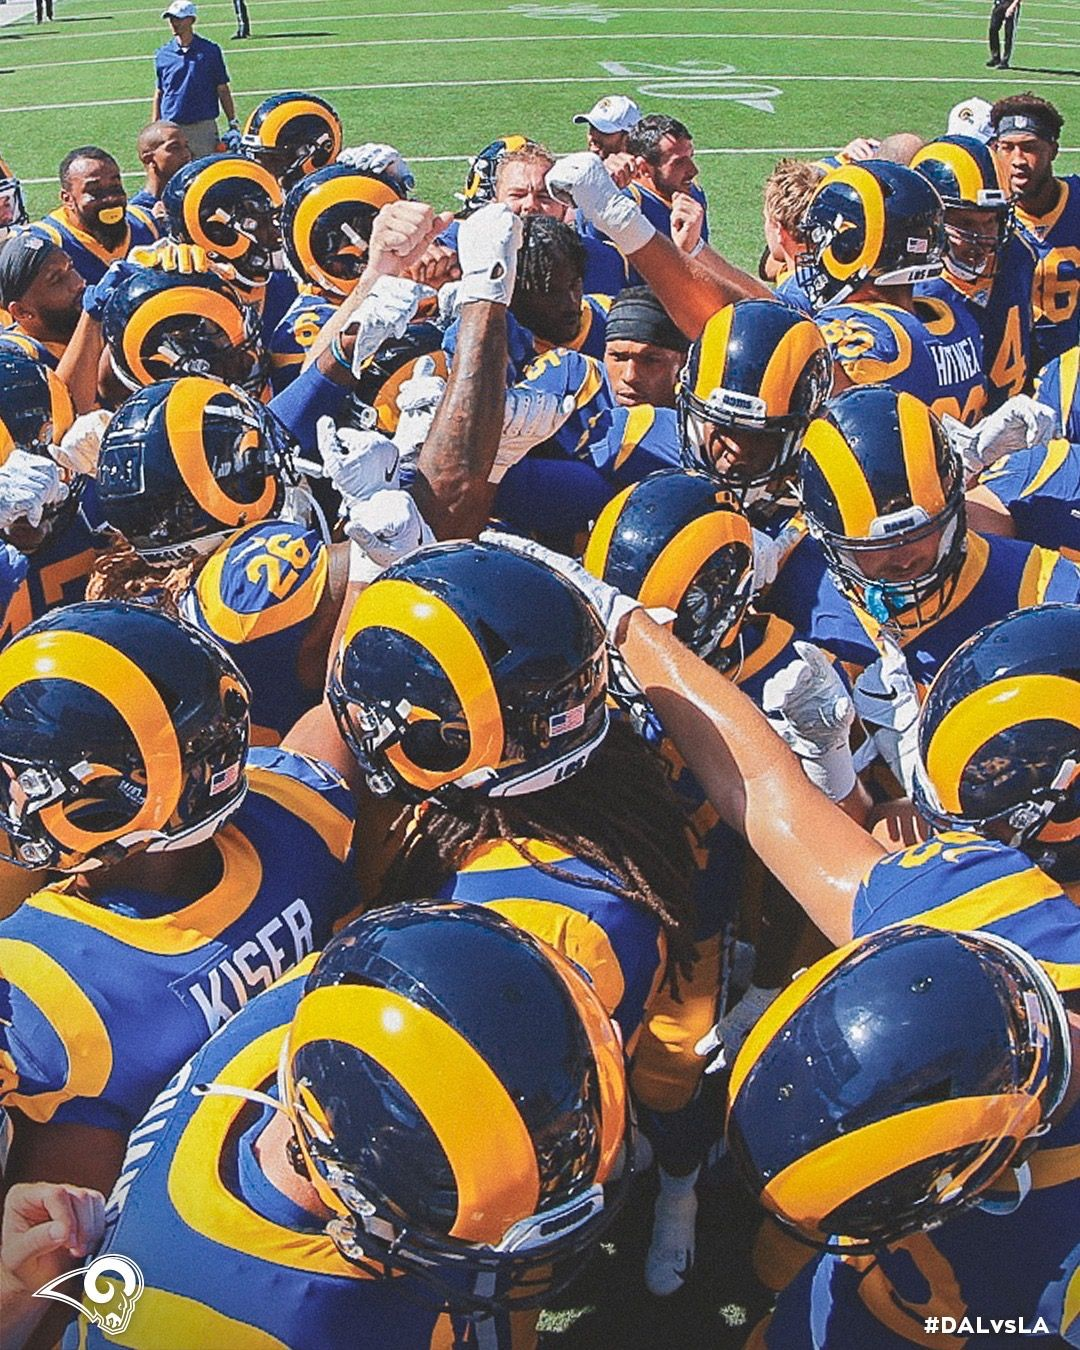 2019 LA Rams La rams, Football helmets, Nfl